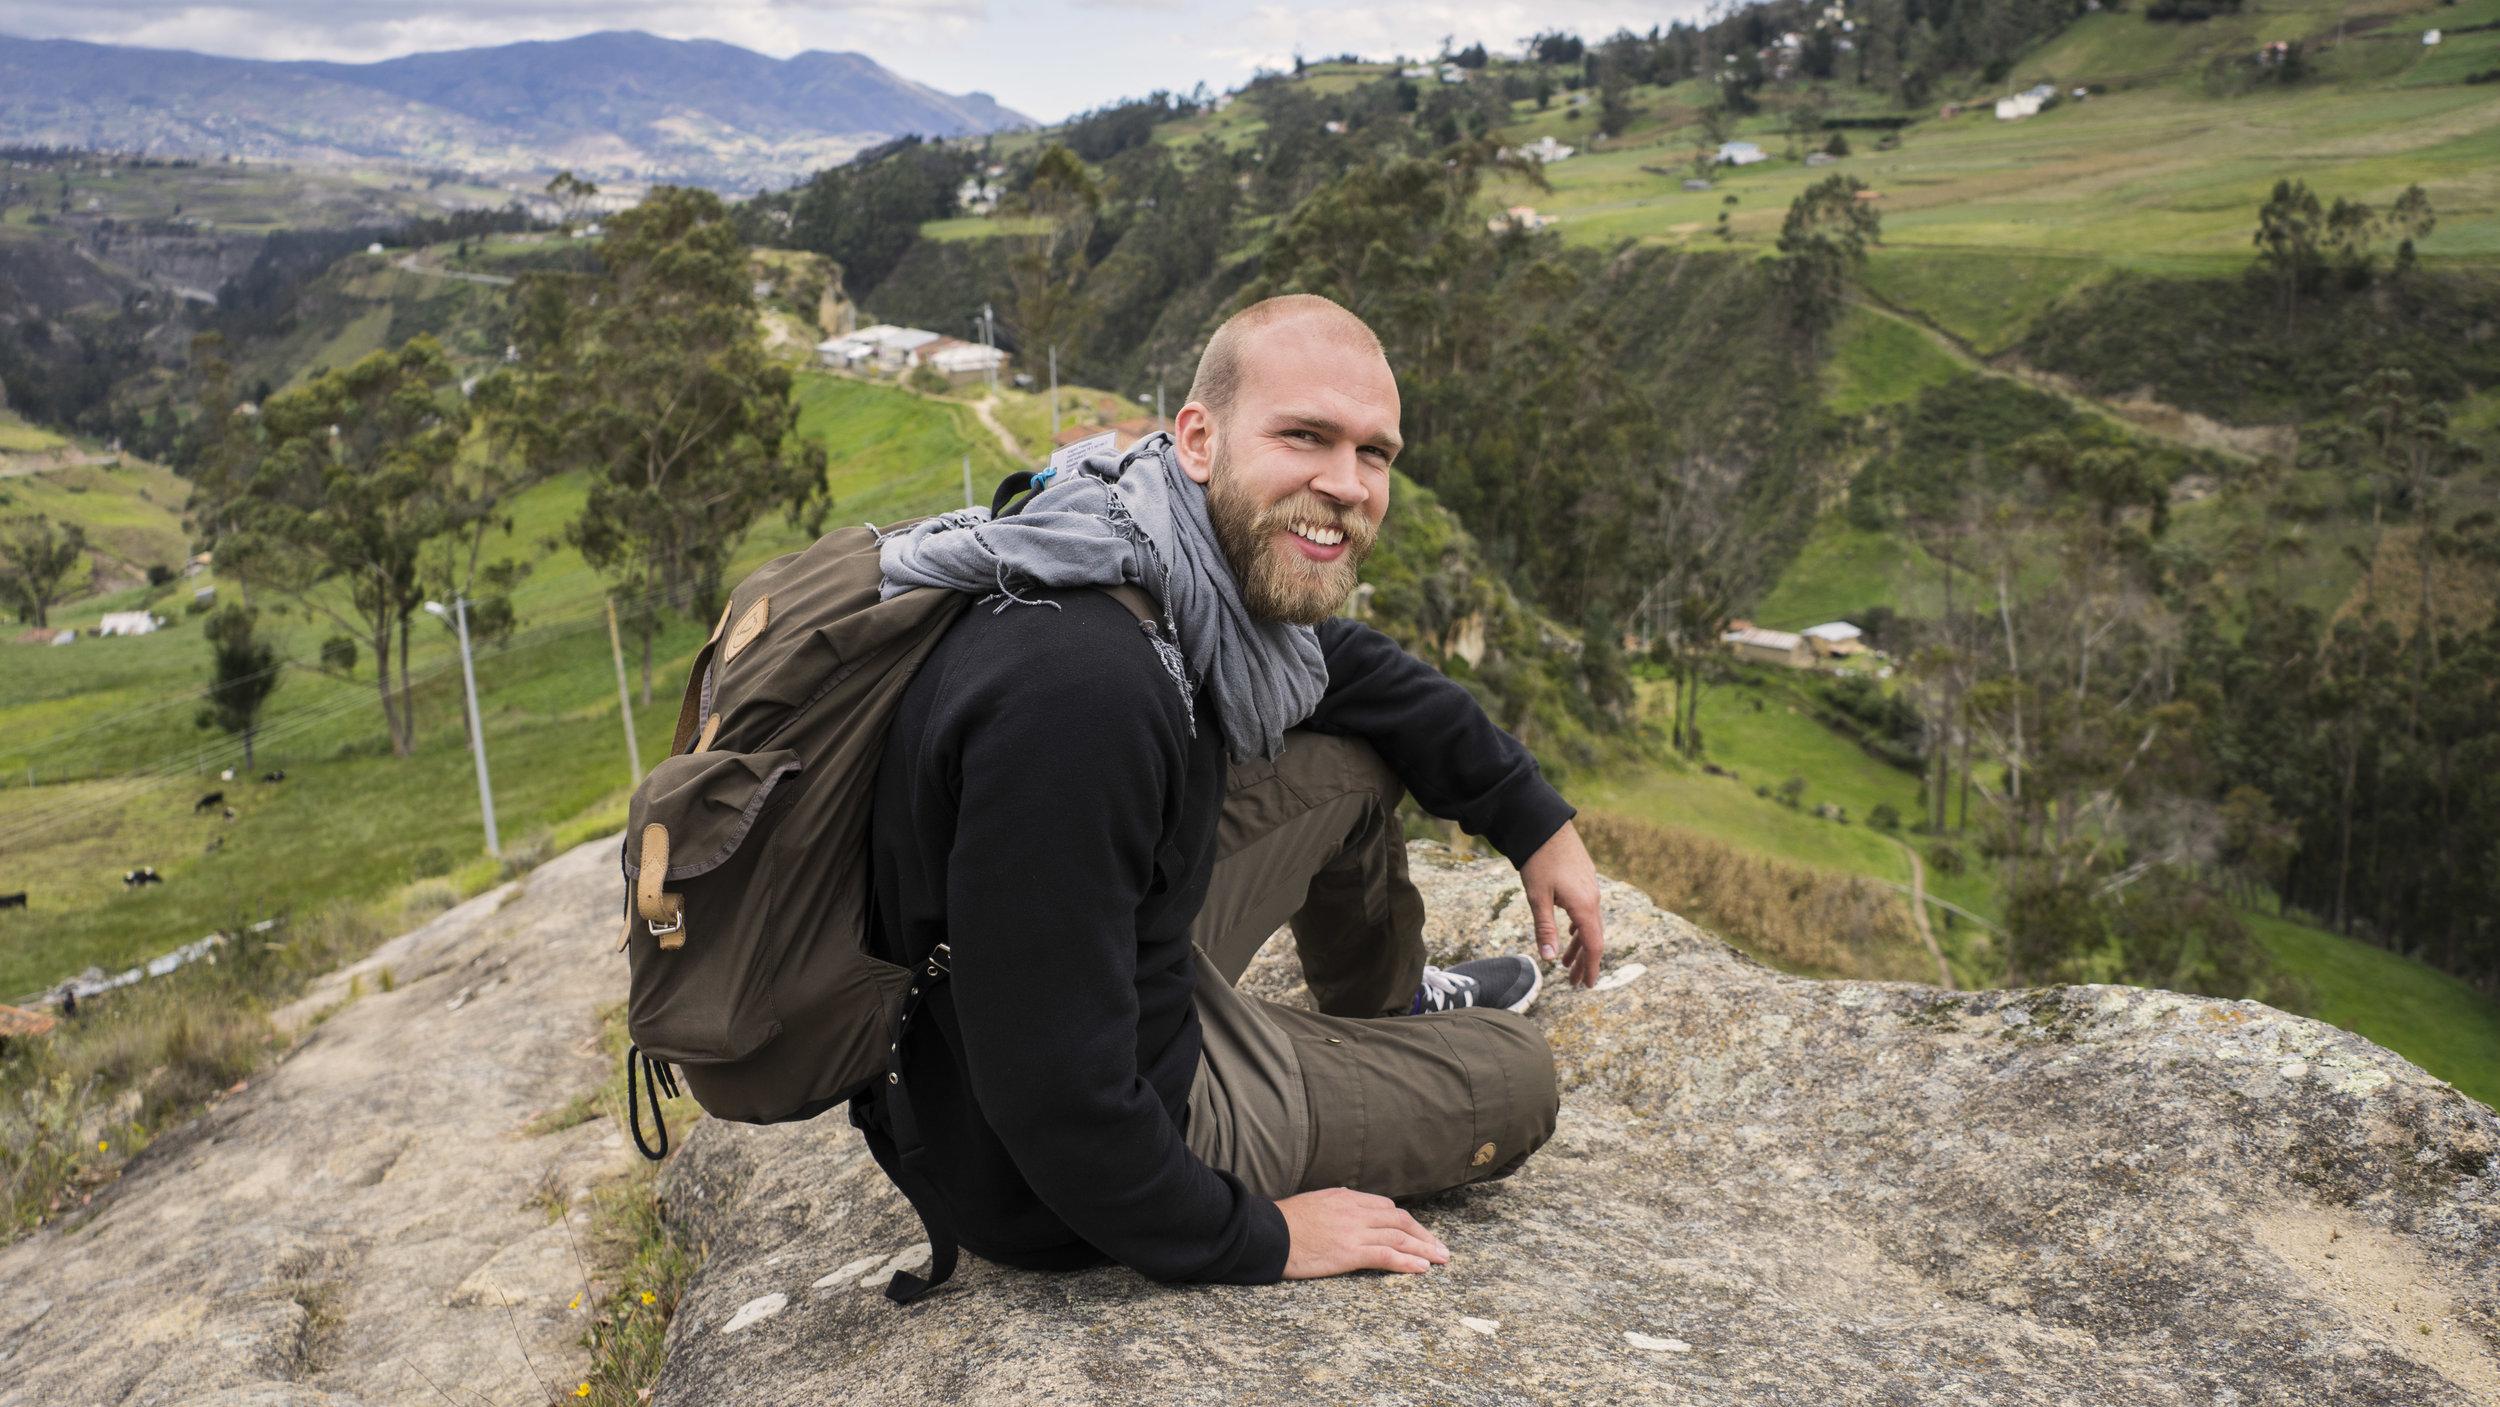 Machu_Picchu_llamas. Photo Credit Jerry Daykin from Cambridge, United Kingdom CC BY 2.0